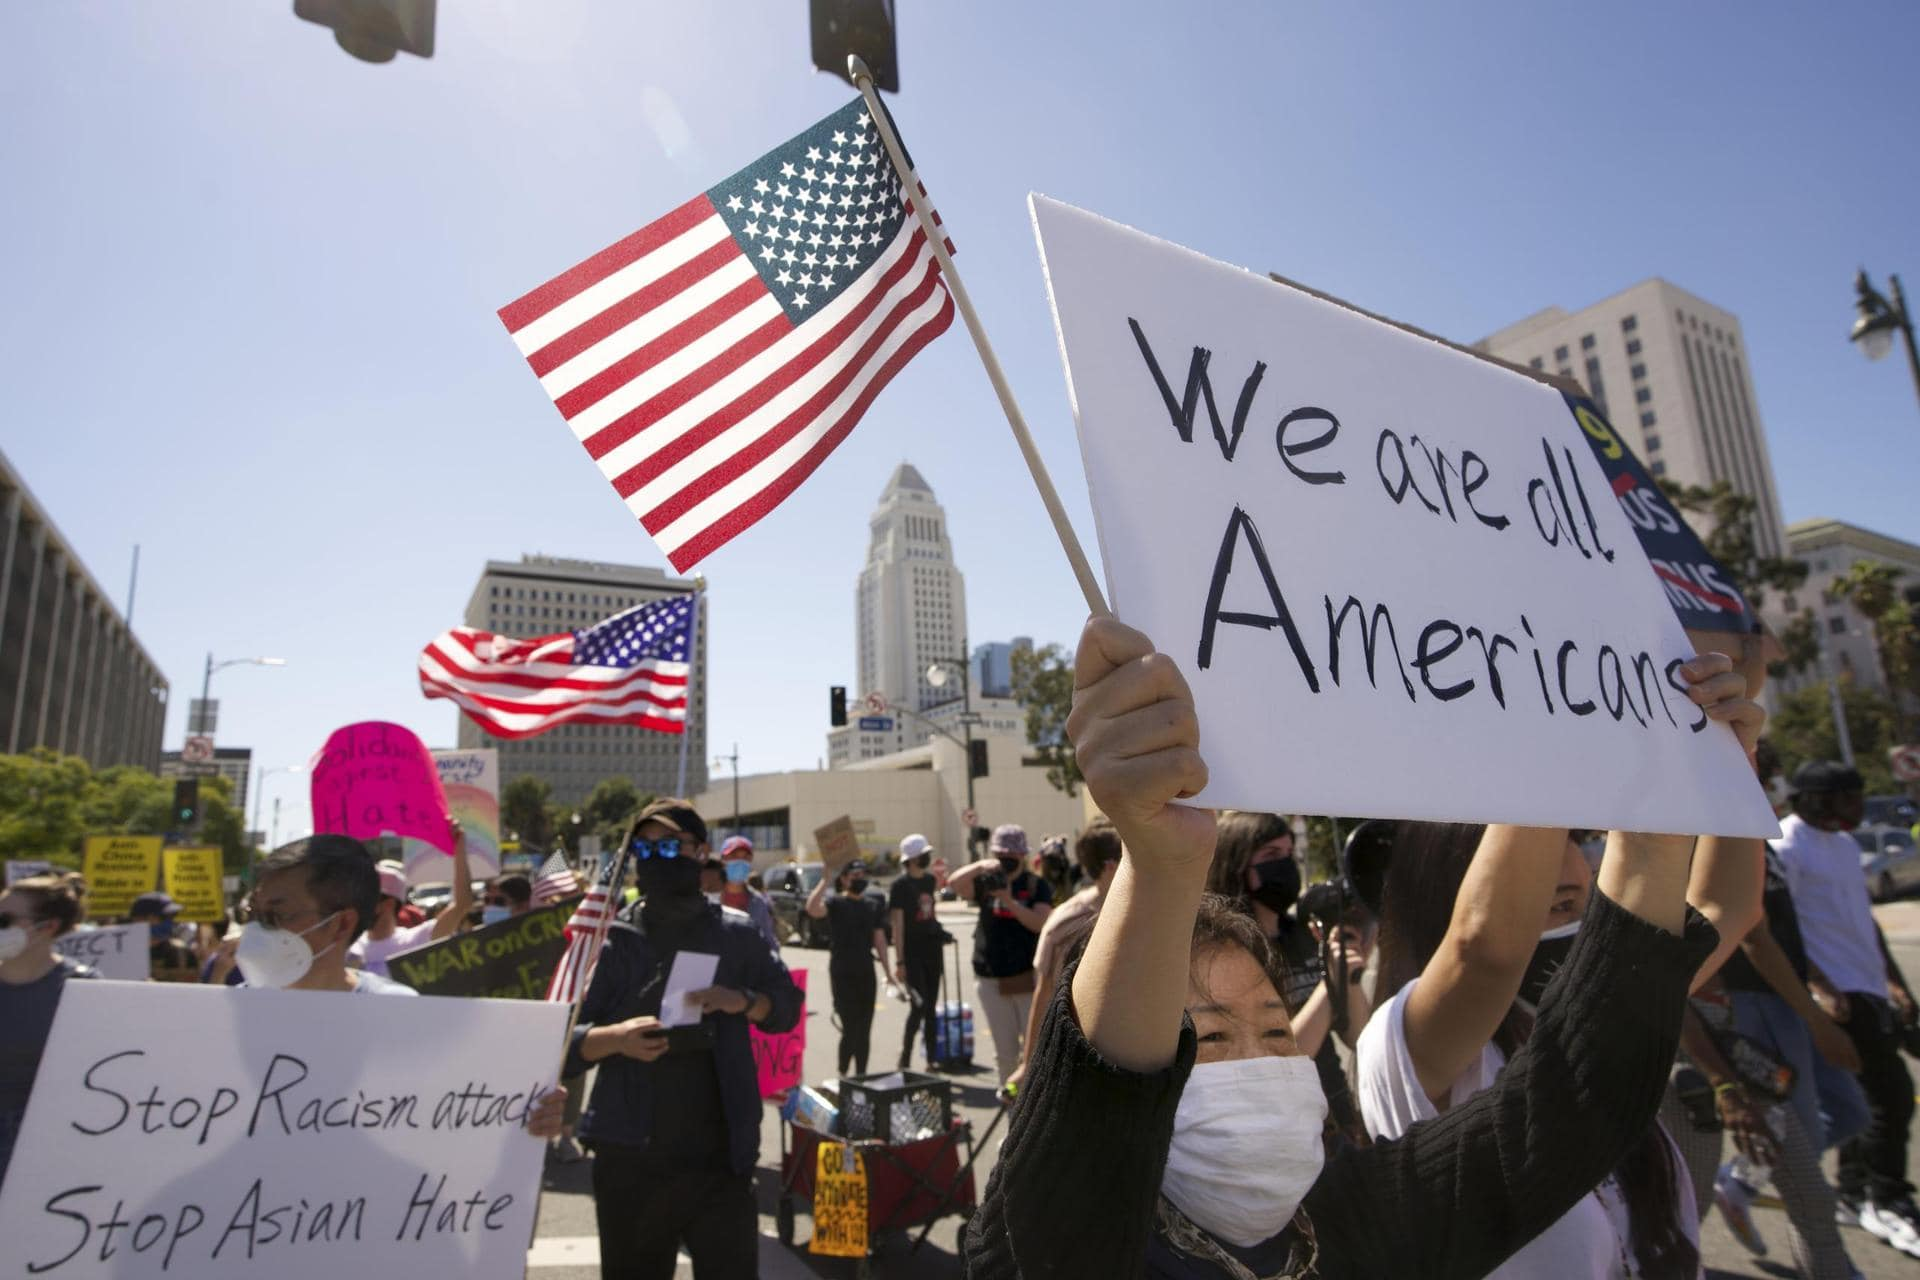 USA verschärfen Kampf gegen anti-asiatische Hassverbrechen Neues Gesetz